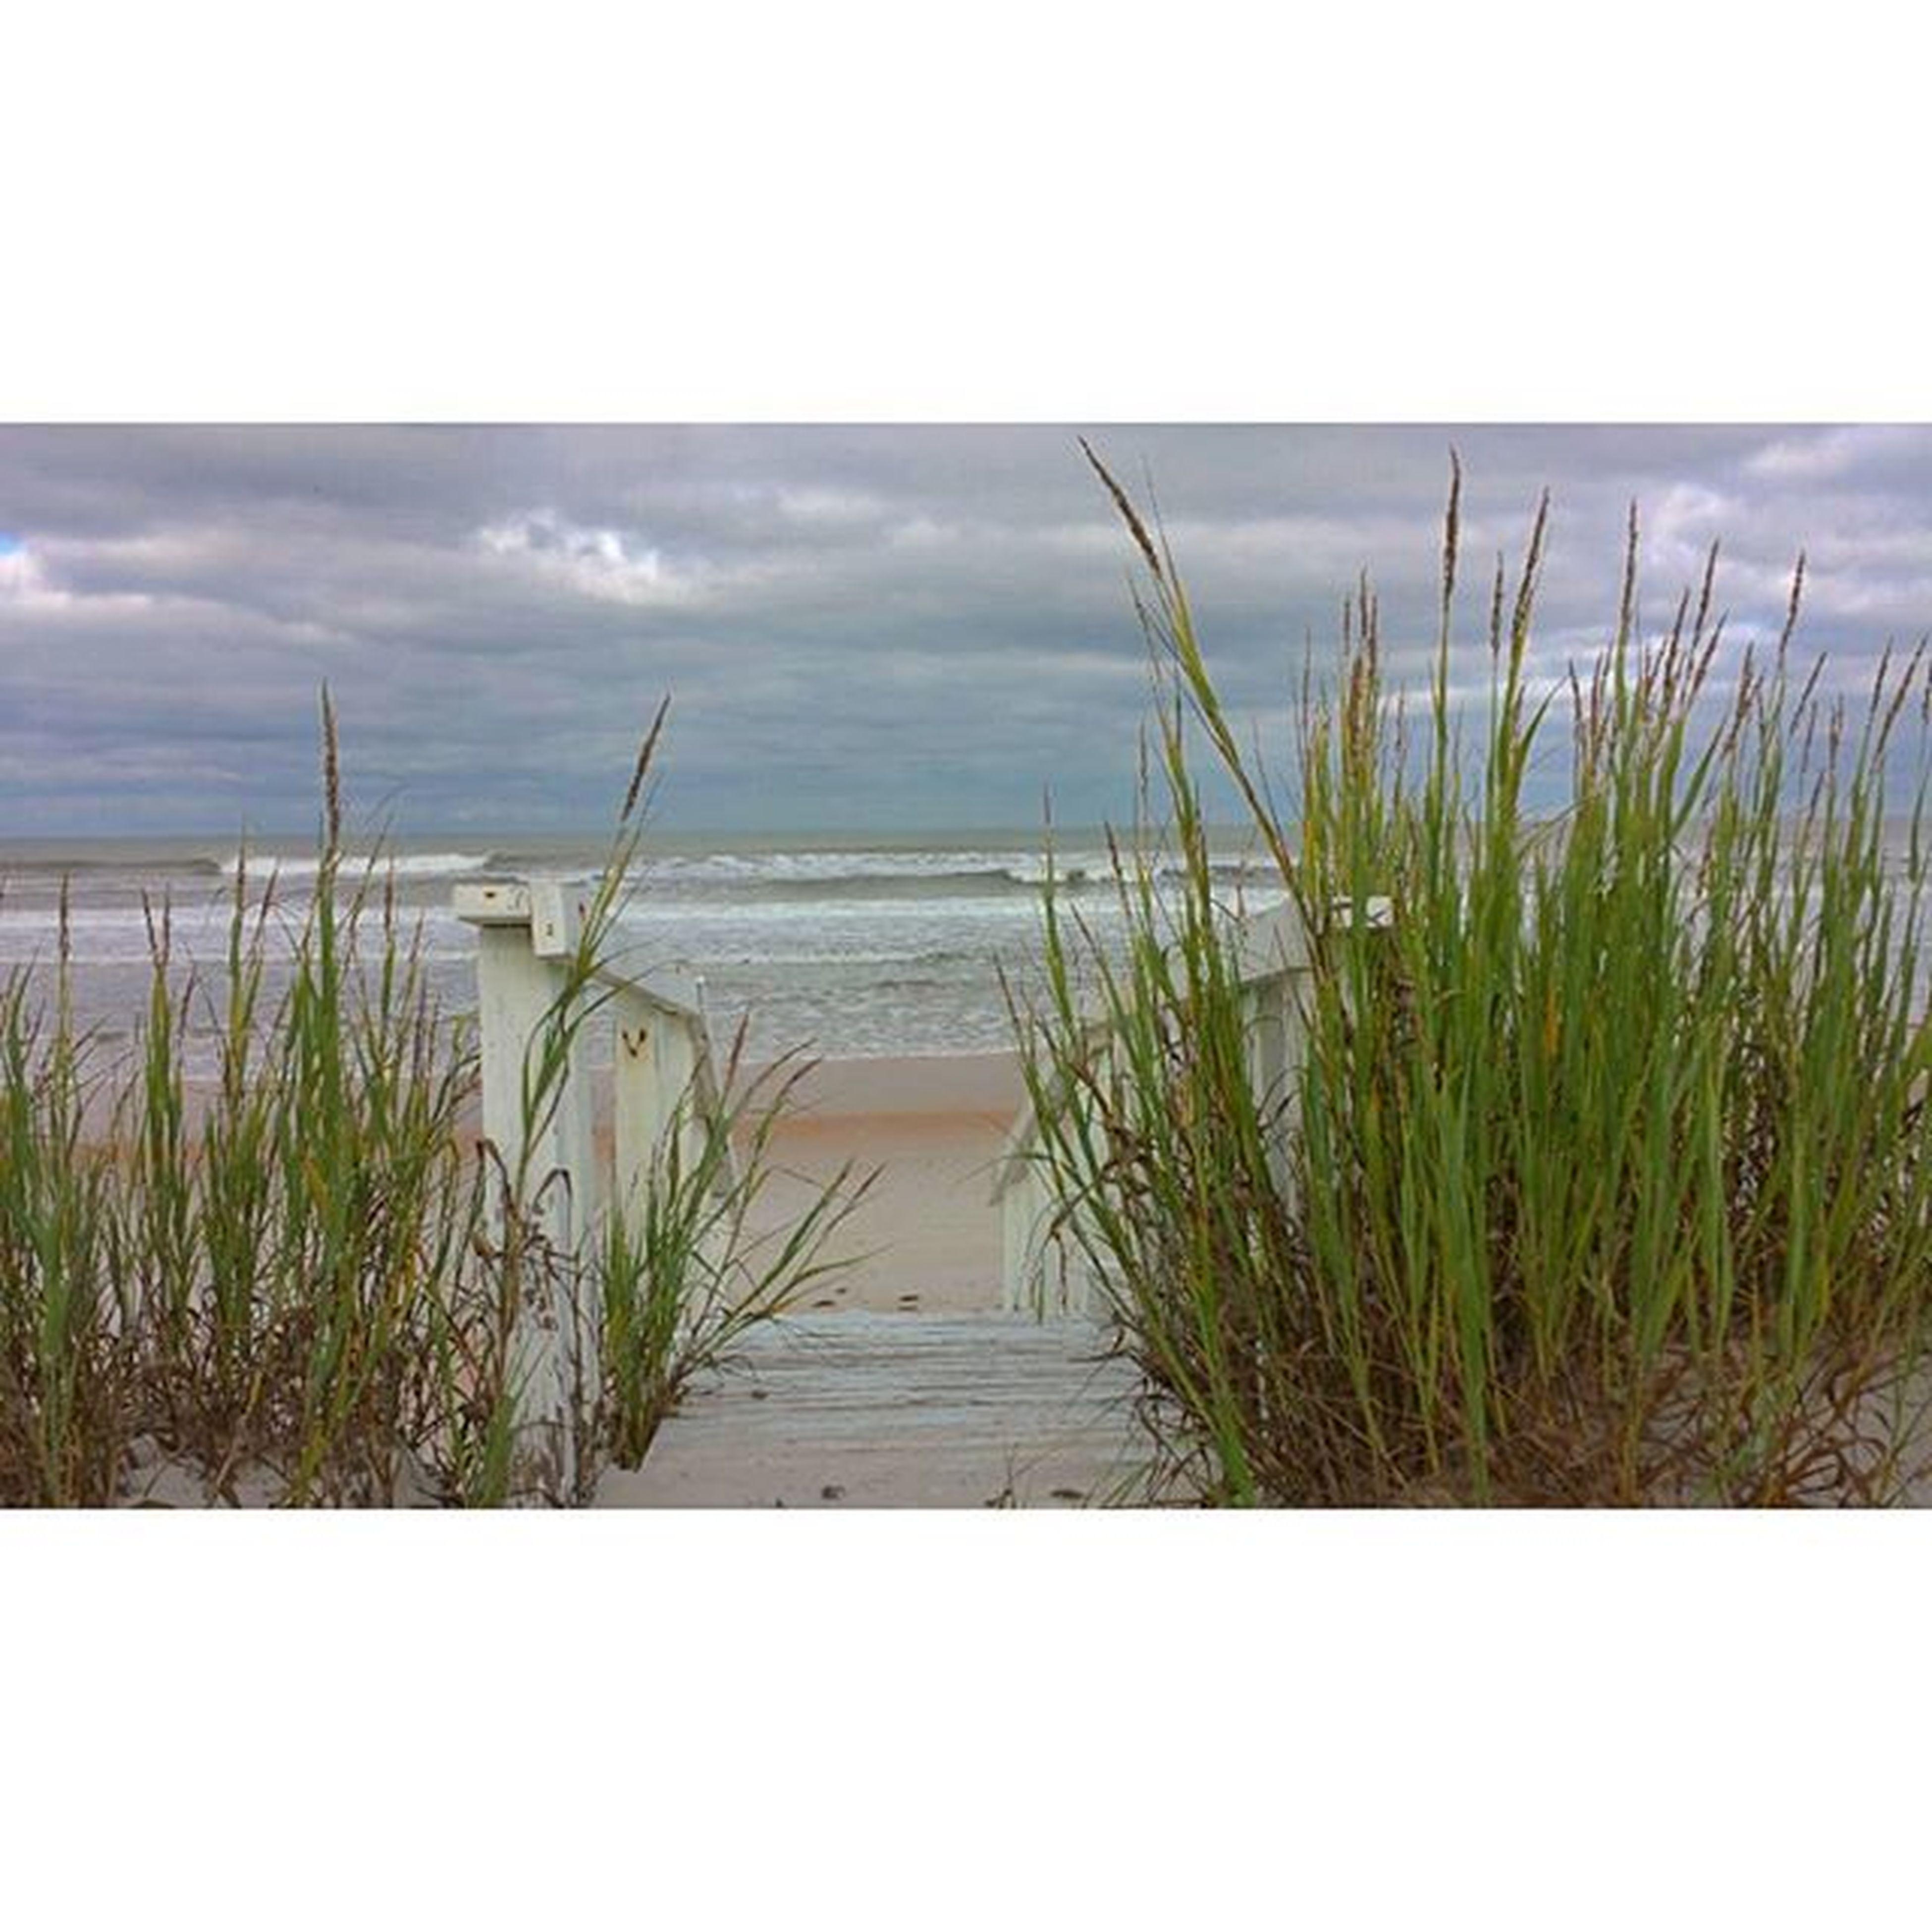 Somewhere on Old A1A. Beachlife Beach Stairway Ocean Coastal Shelling Nature Sanddunes Seaoats Outdoors Exploring Beachfront Cloudy Ilovestaugustine Olda1a Staugustine Igersstaugustine A1A Igersdaily Igers IGDaily Florida Pureflorida Roamflorida Ig_greatshots_fla iloveFL